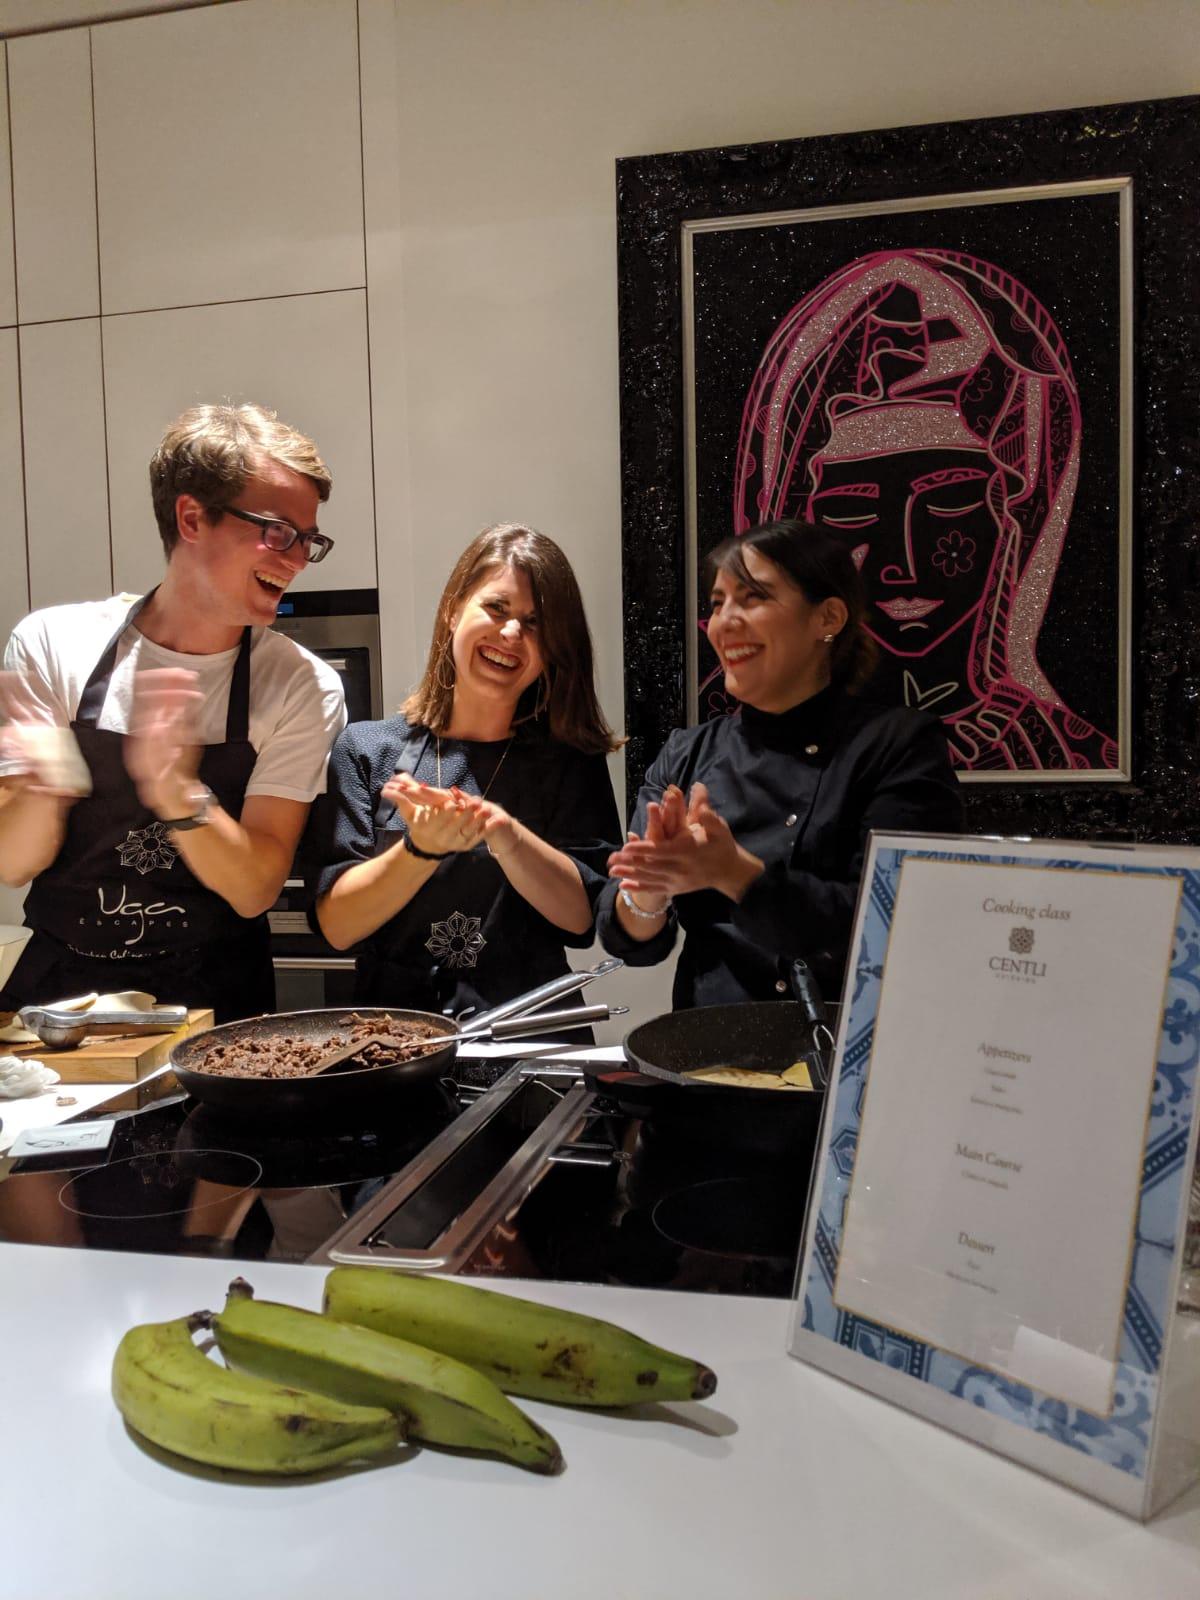 Centli Catering Munich | Elia Hernandez | Cooking Class 2019